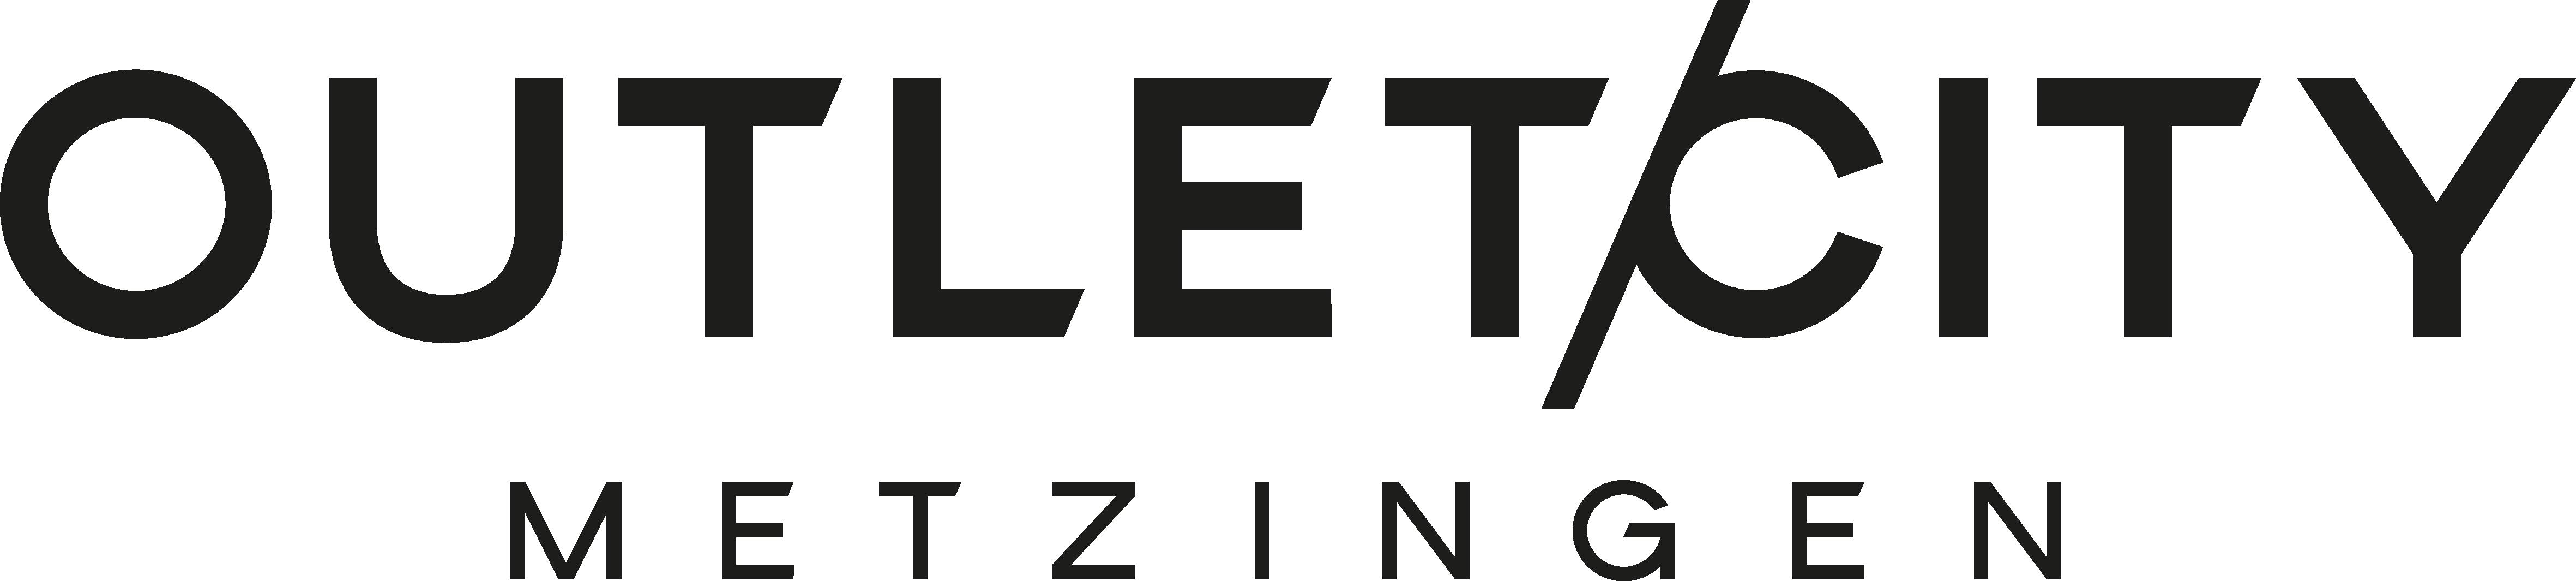 Outlet City Metzingen